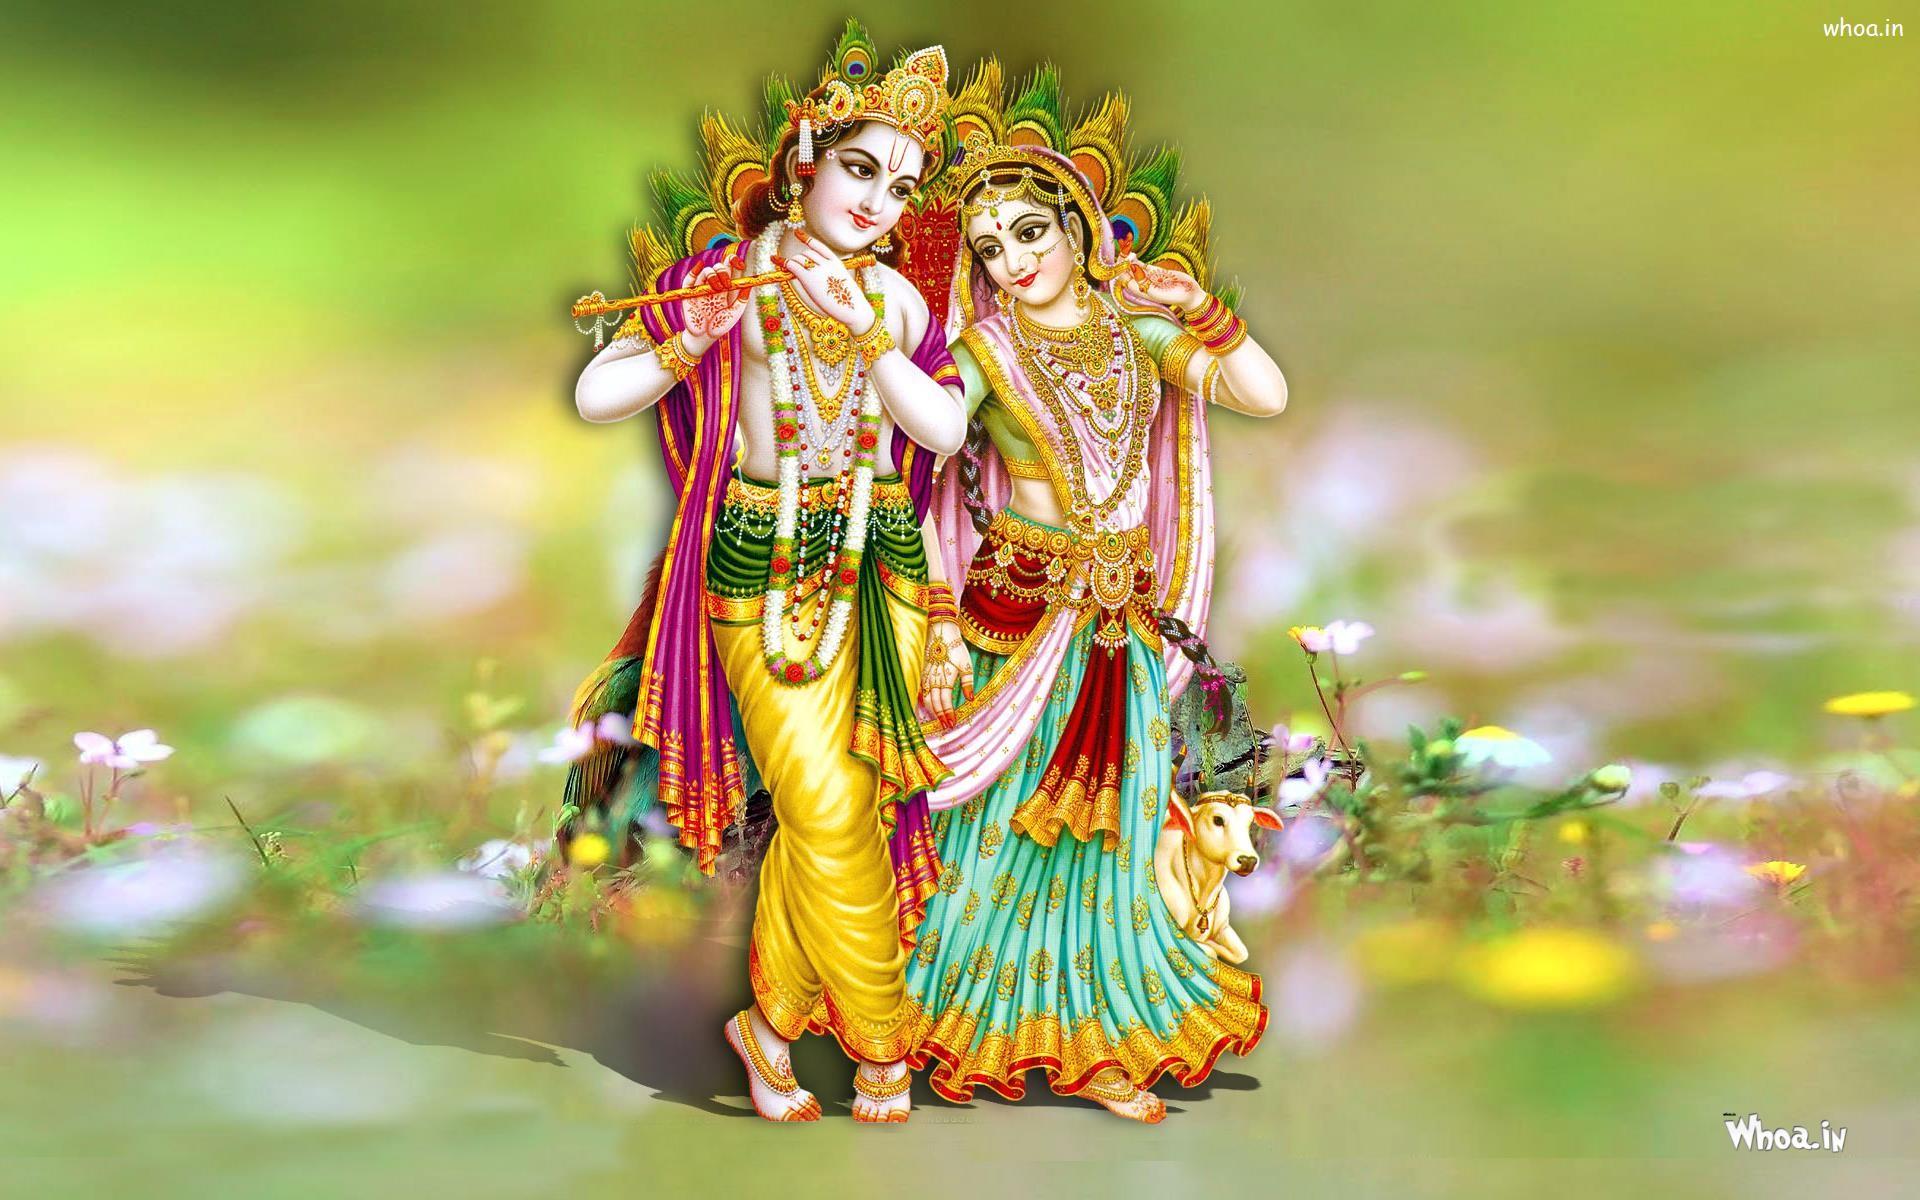 Lord Venkateswara Hd Wallpapers For Windows 7 Radha Krishna Hd Wallpapers 68 Images